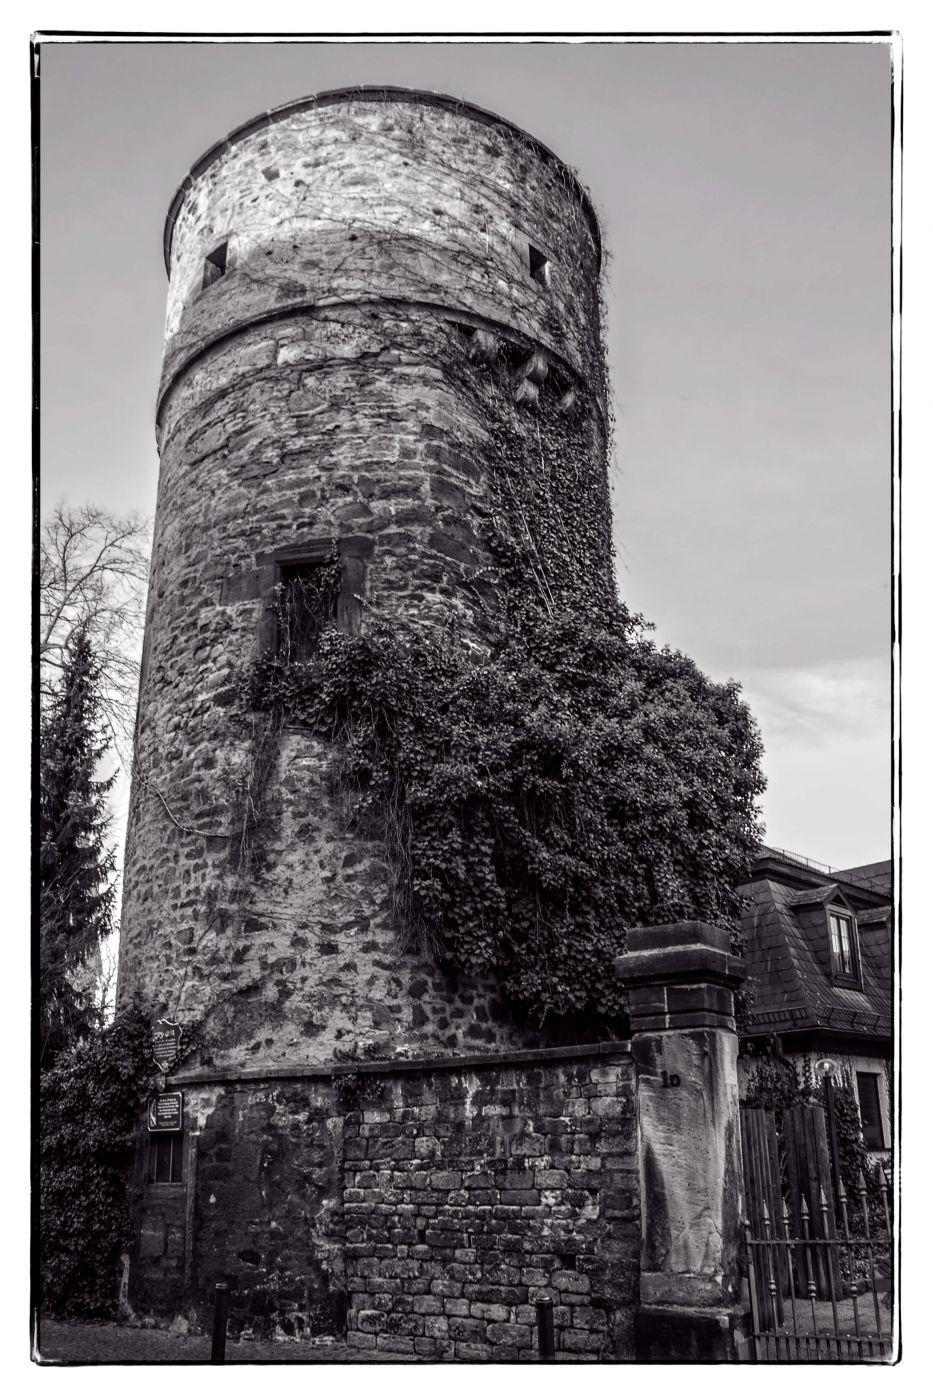 Hexenturm, Germany